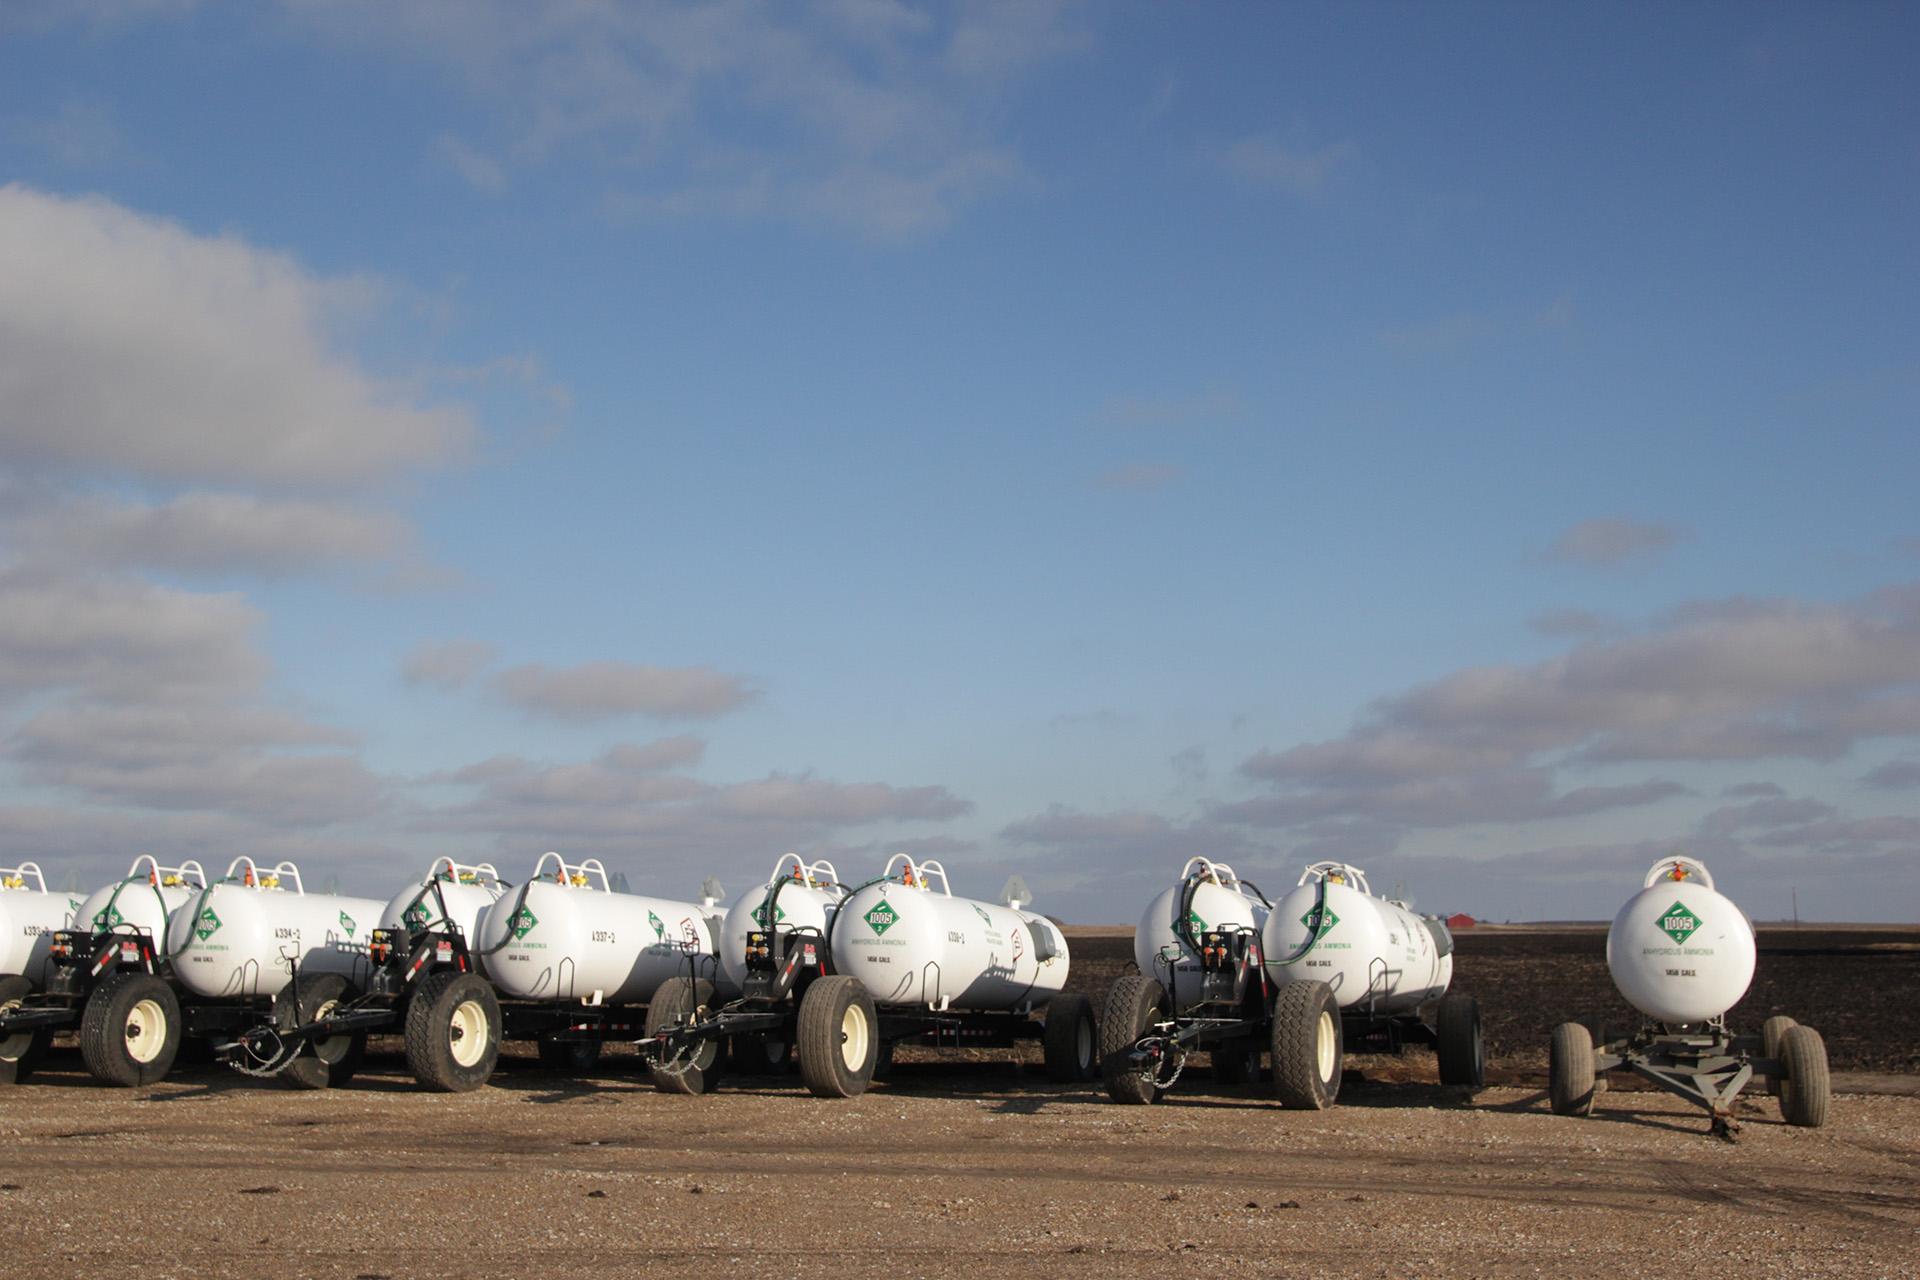 containers of_ammonia fertilizer